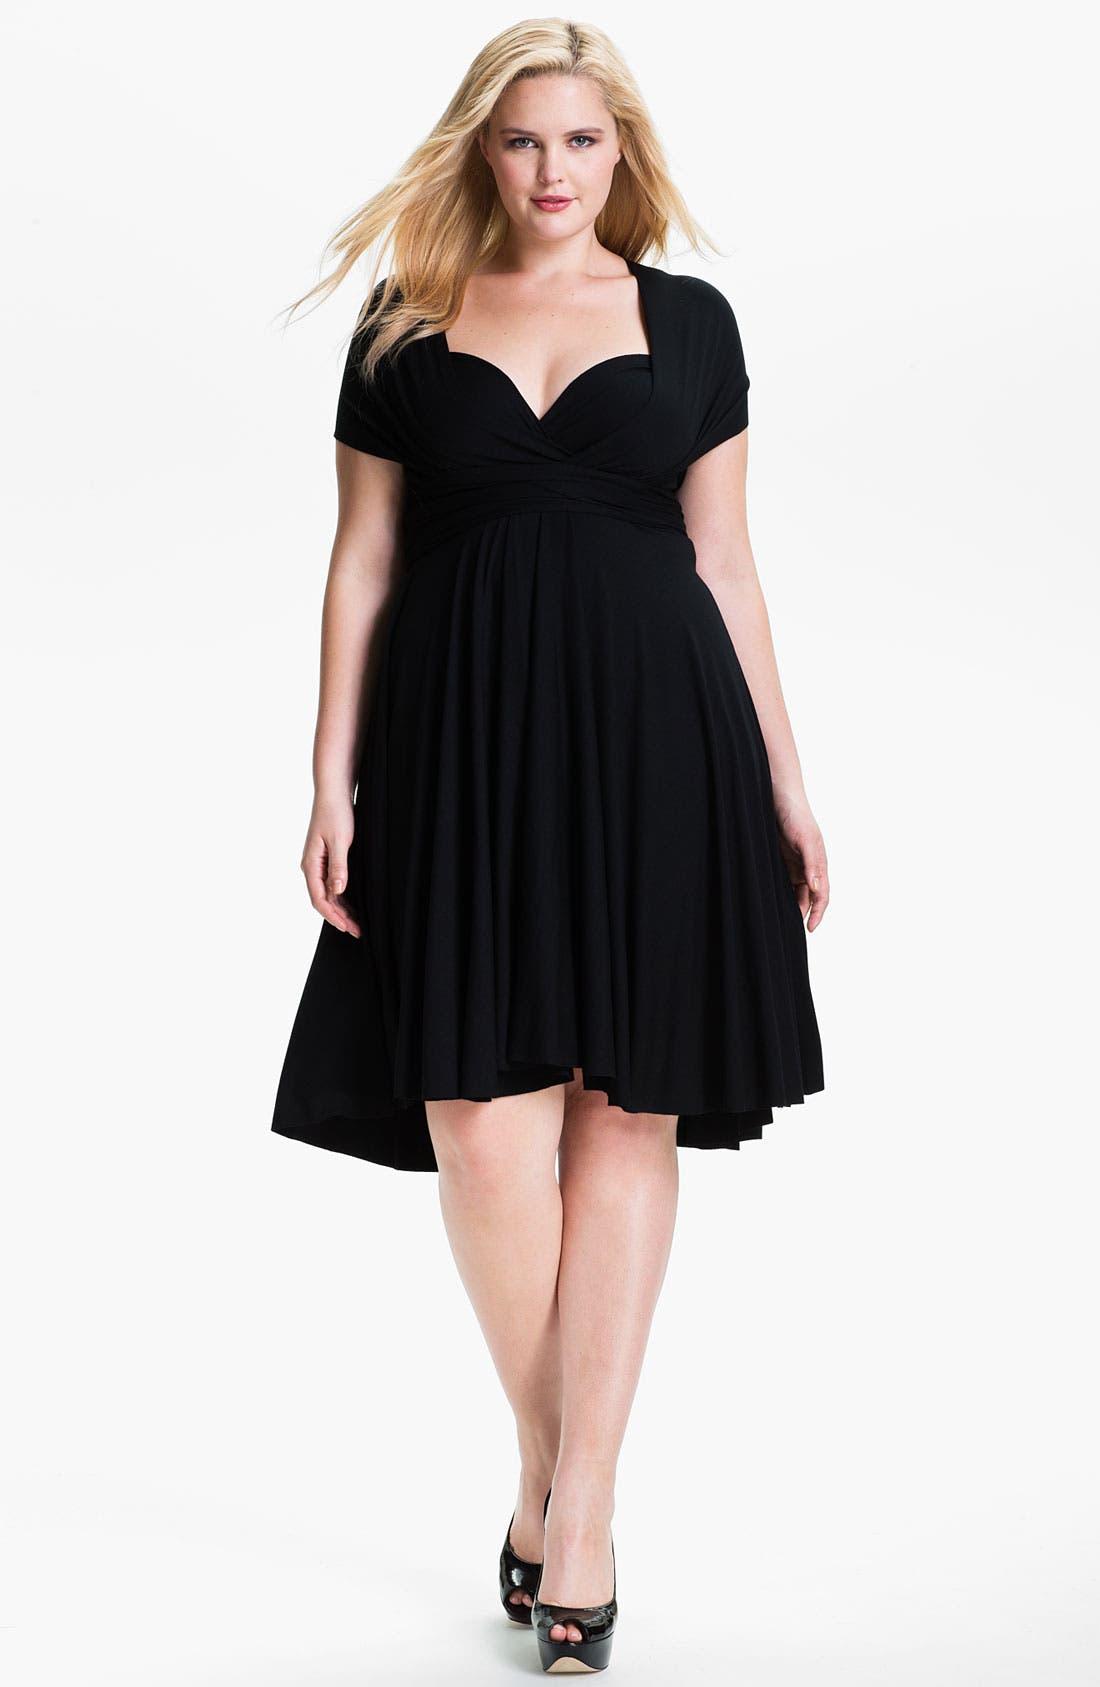 Alternate Image 1 Selected - Monif C 'Marilyn' Convertible Jersey Dress (Plus)